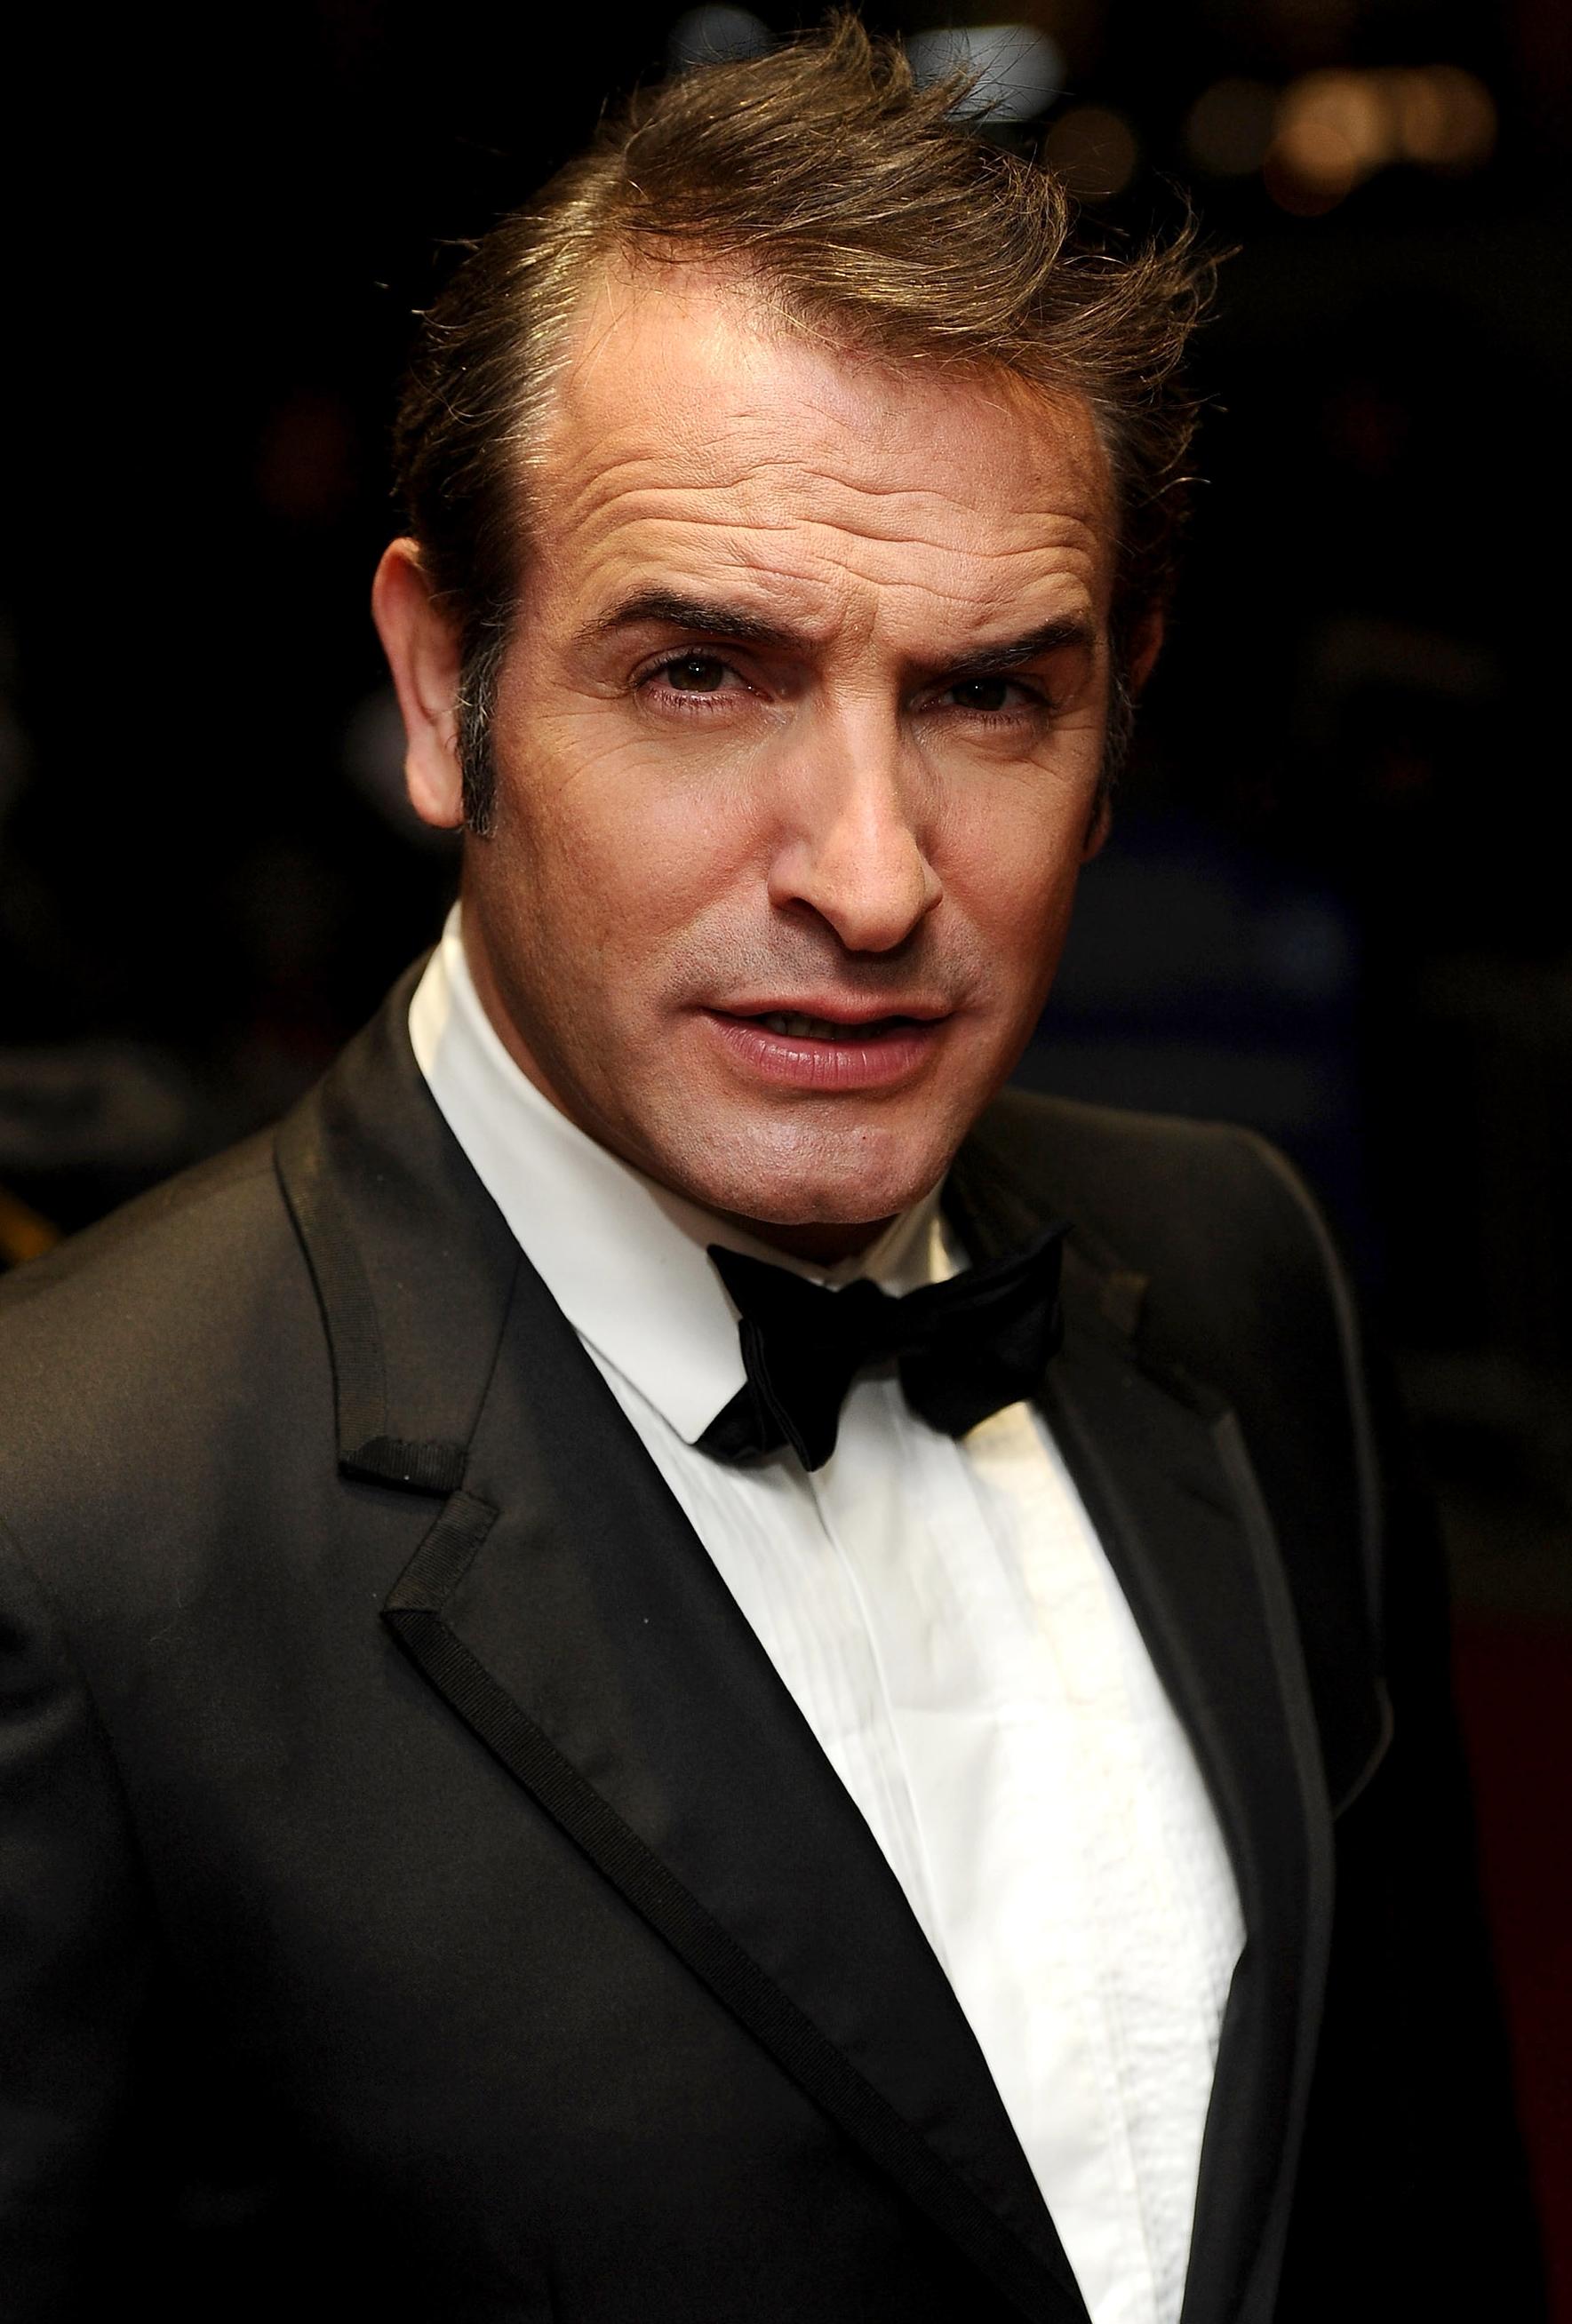 Jean dujardin actor for Jan du jardin